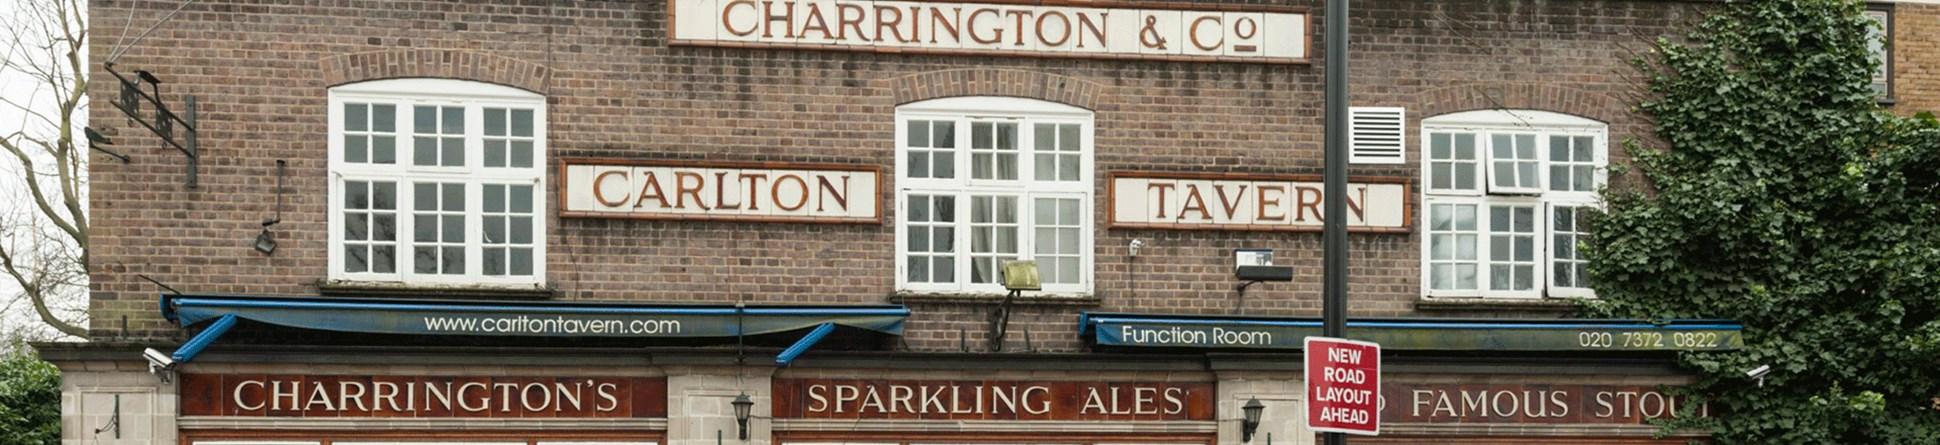 Picture of the interwar pub, the Carlton Tavern Maida Vale, before demolition.